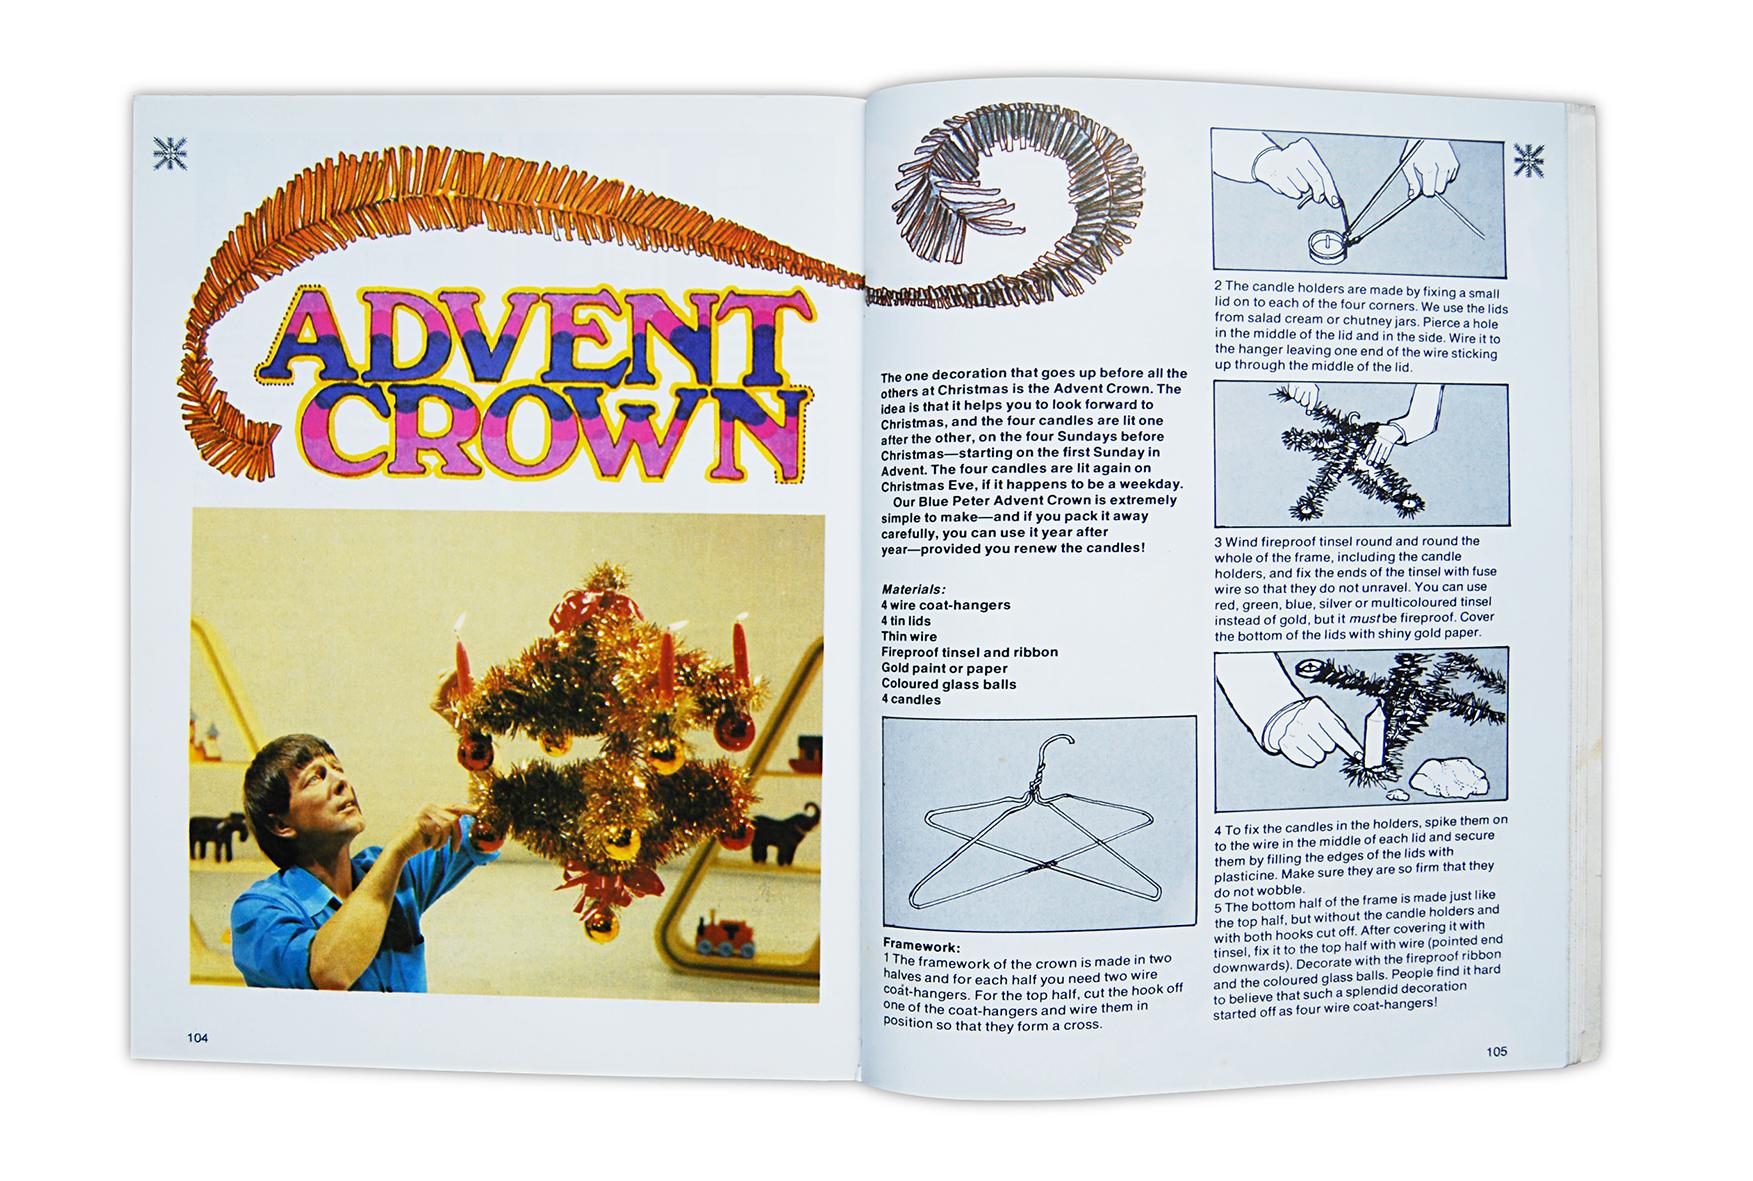 adventcrown